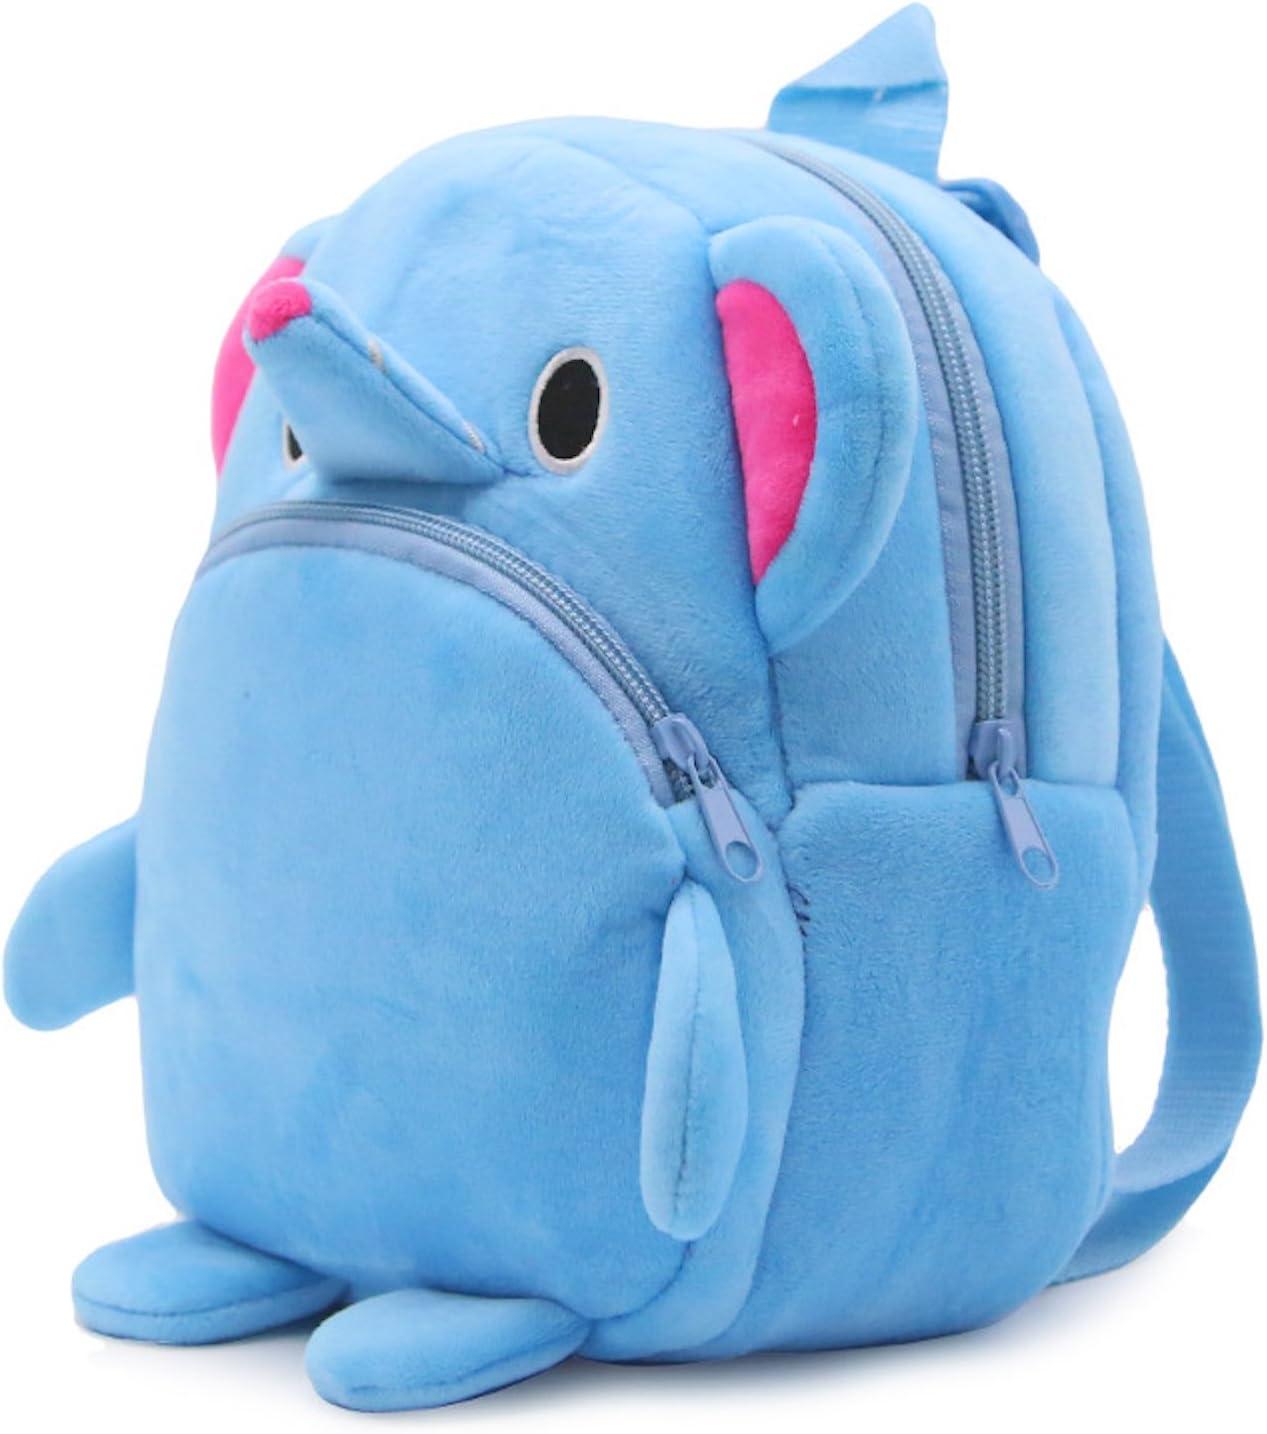 ni/ño correa ligera bolsa de escuela para ni/ño para beb/é elefante ni/ña compras edad de 1 a 3 a/ños Mochila infantil de peluche Elonglin mochila para viajes dise/ño de animales